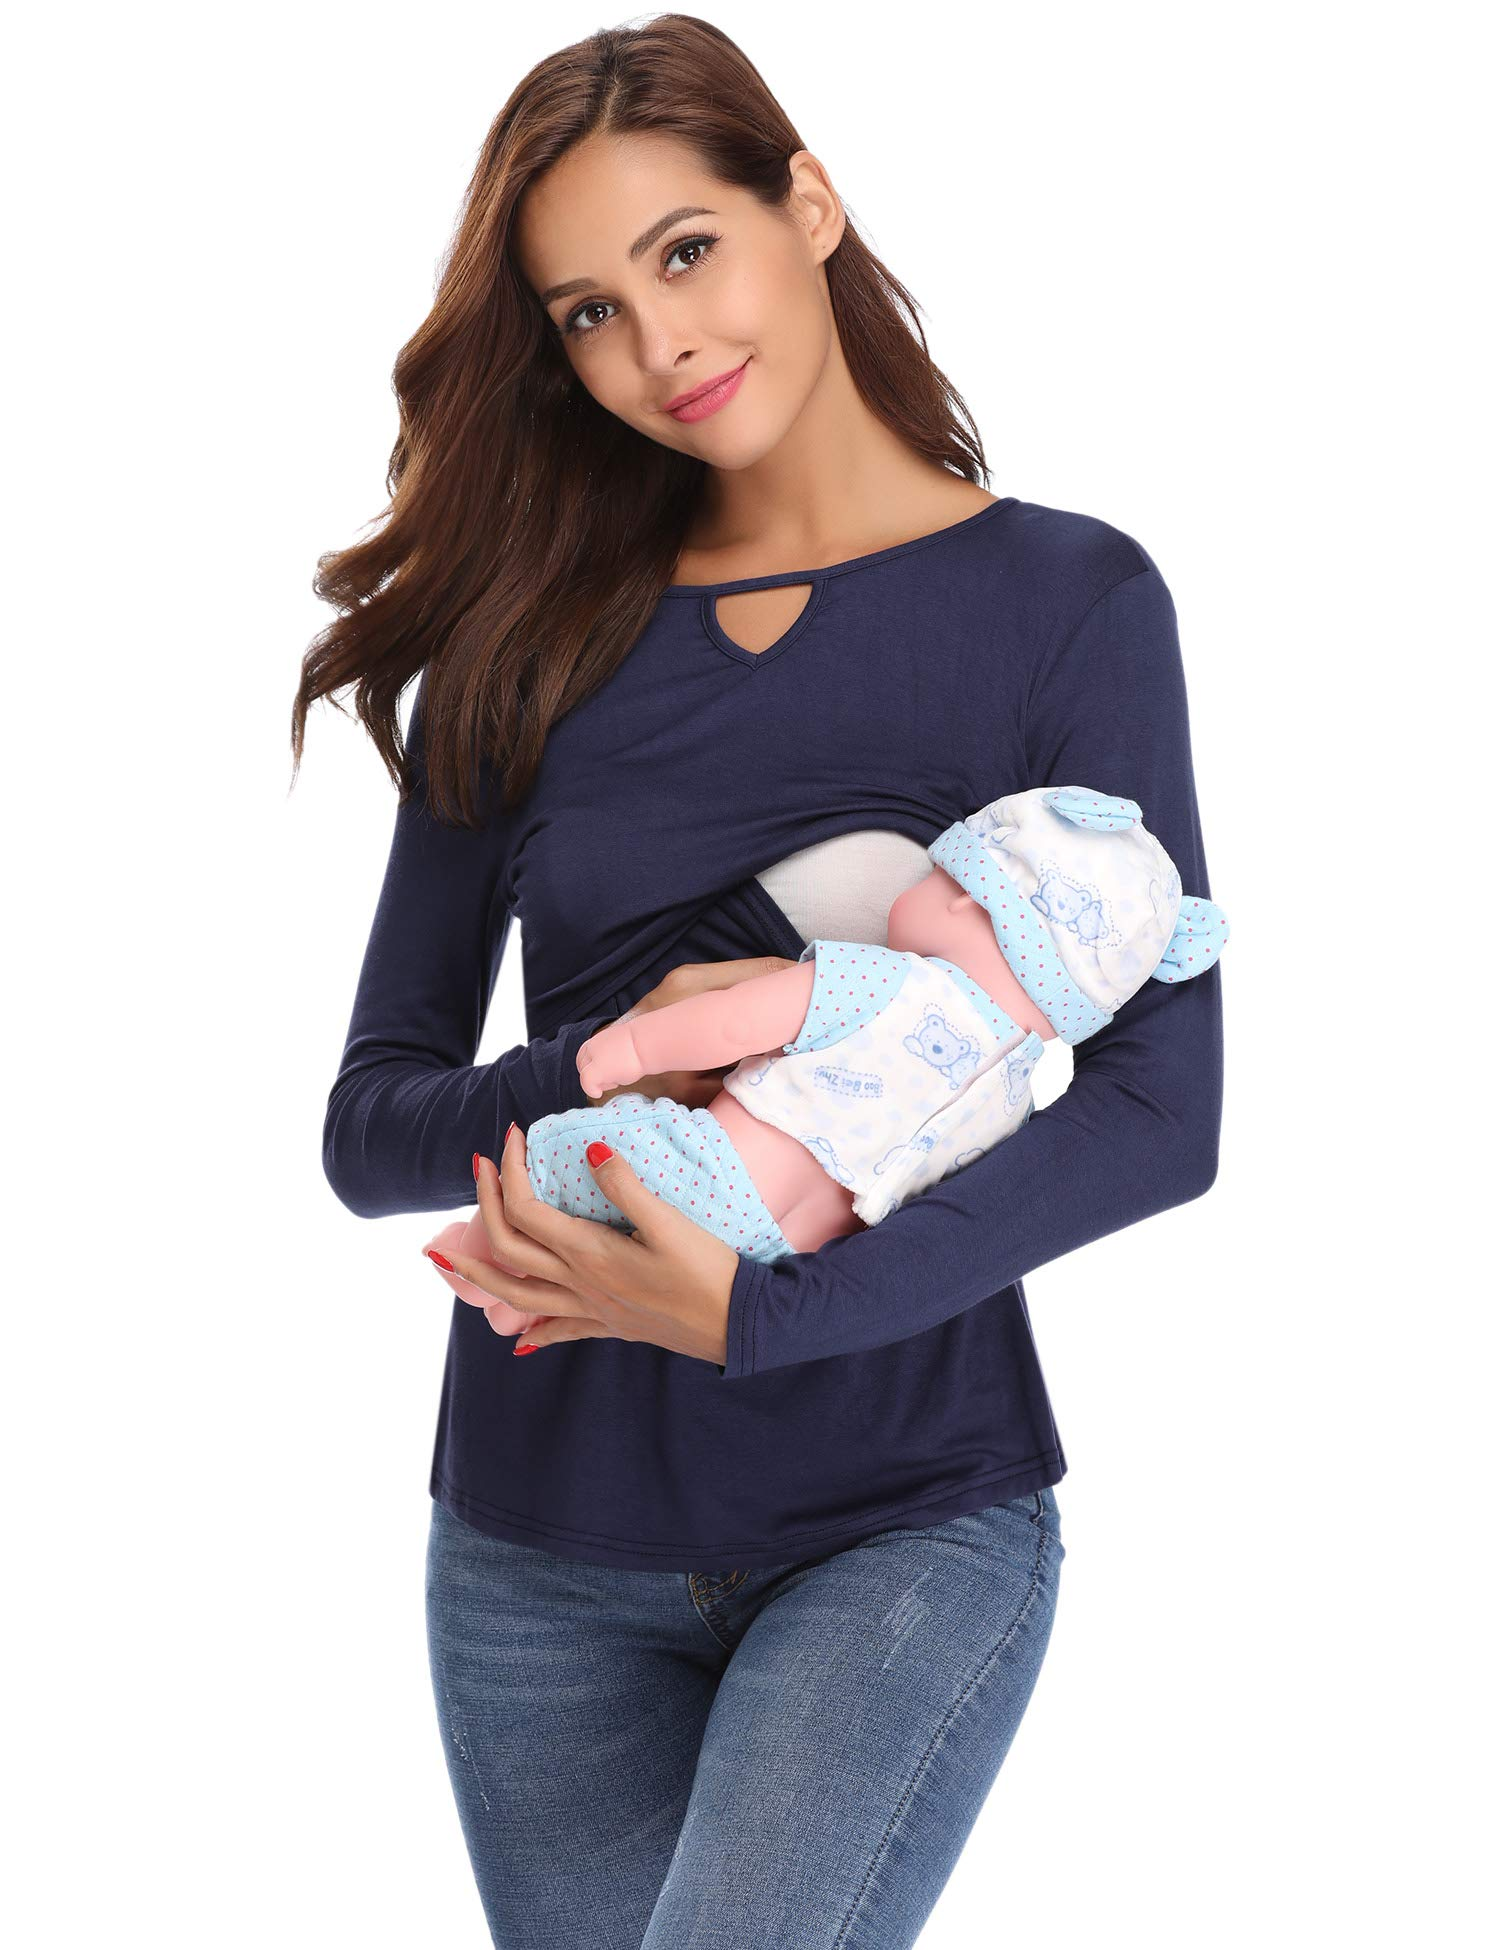 Abollria Women\'s Maternity Tee Long Sleeve Soft Easy Breastfeeding Tops Shirts